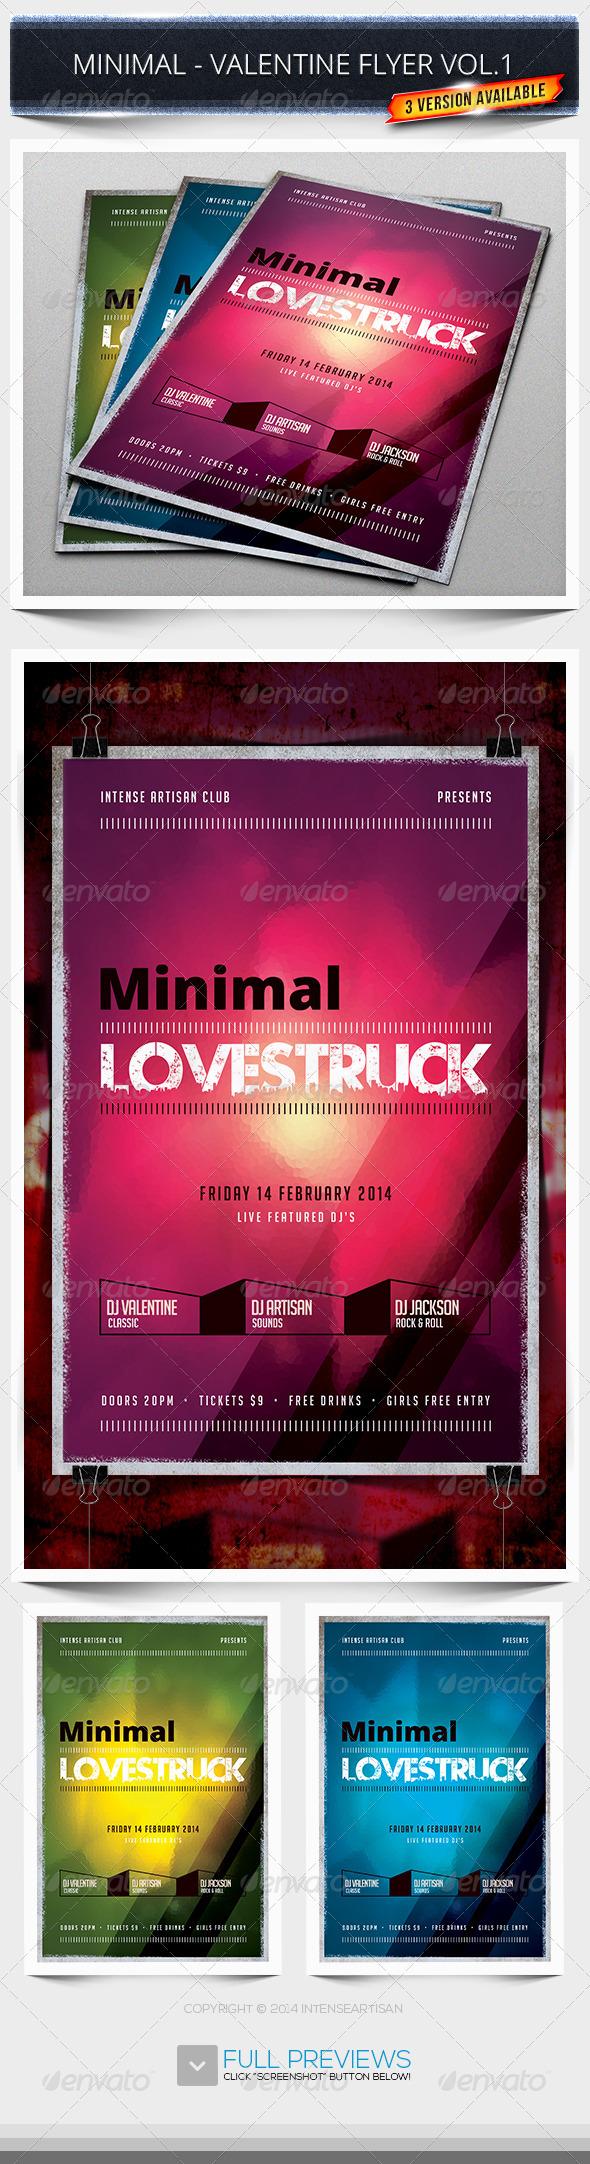 GraphicRiver Minimal Valentine Flyer Vol.1 6765645